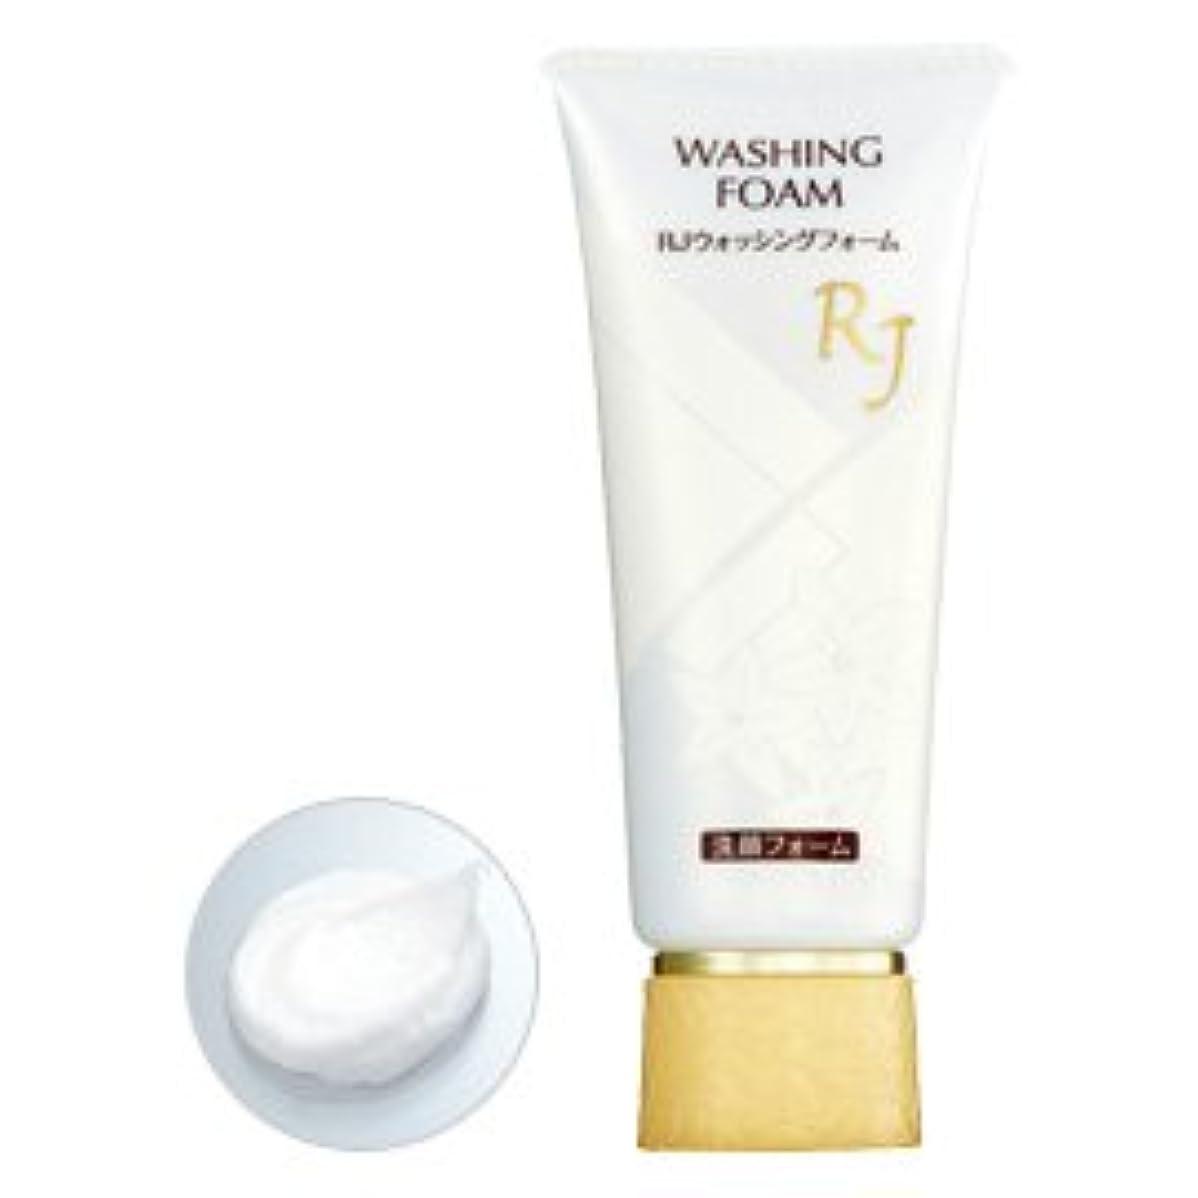 RJウォッシング(洗顔) フォーム 100g / RJ face wash <100g>